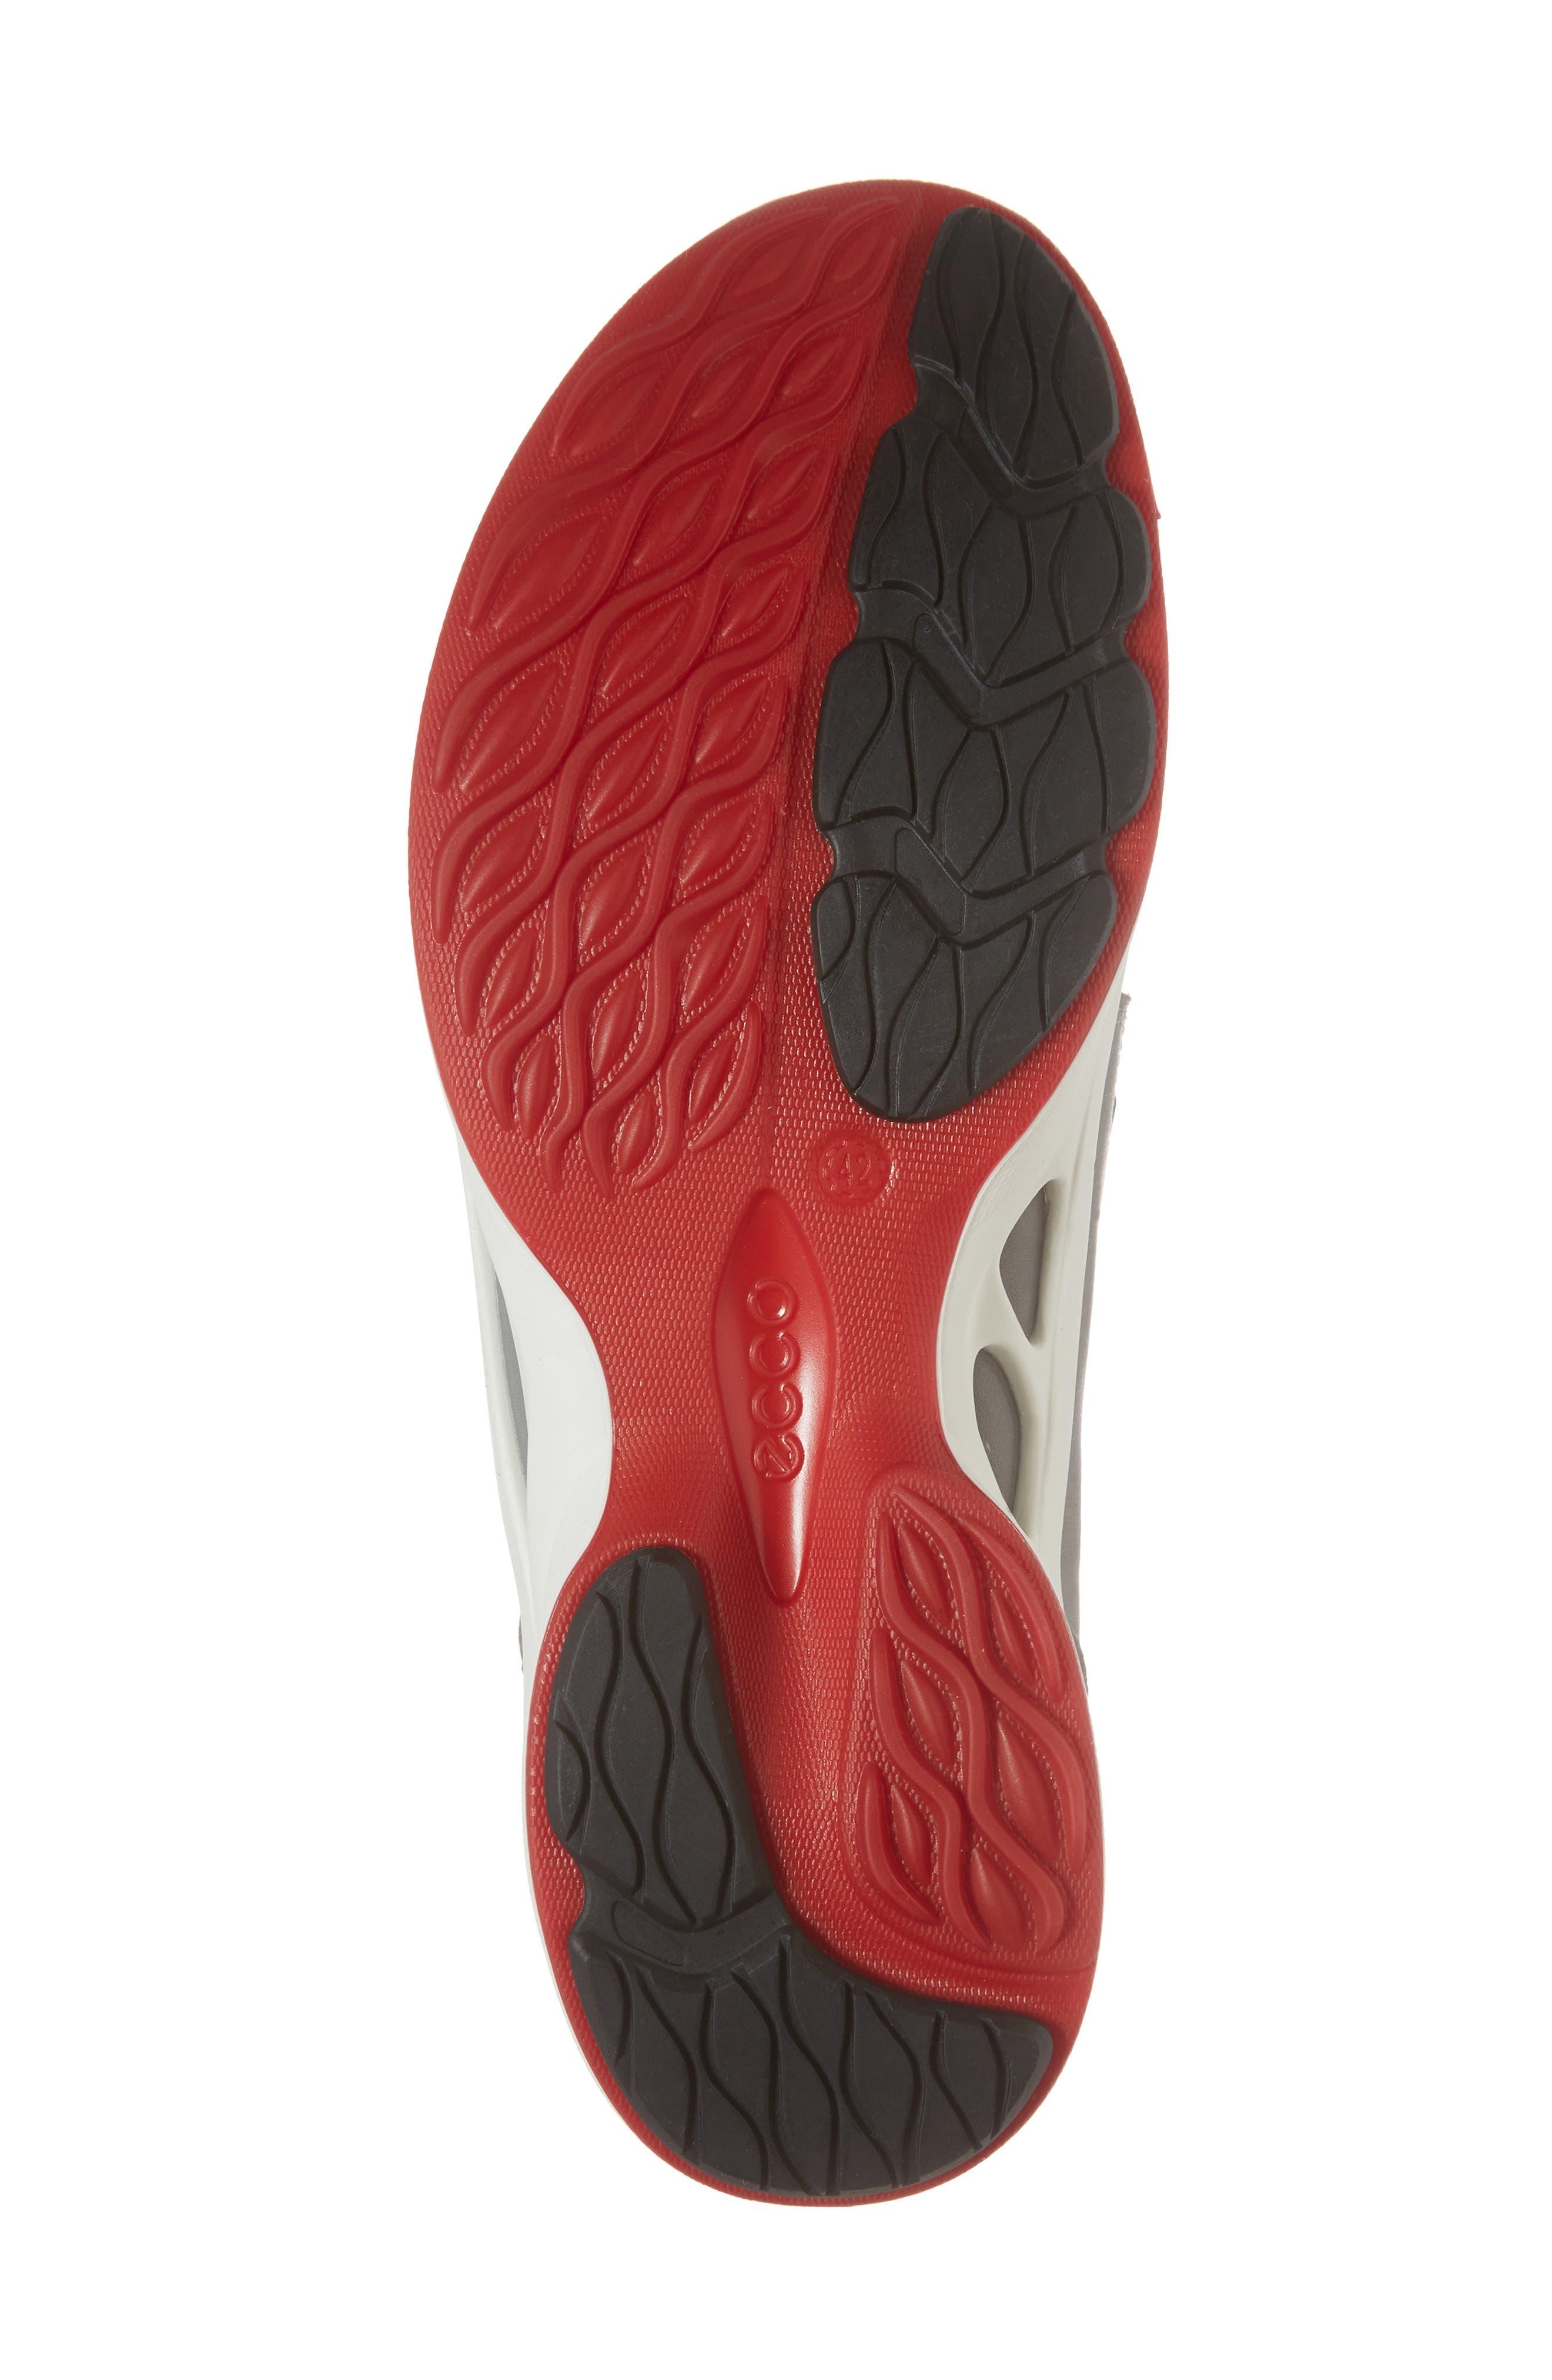 BIOM Fjuel Band Sneaker,                             Alternate thumbnail 6, color,                             Dark Shadow/ Titanium Leather